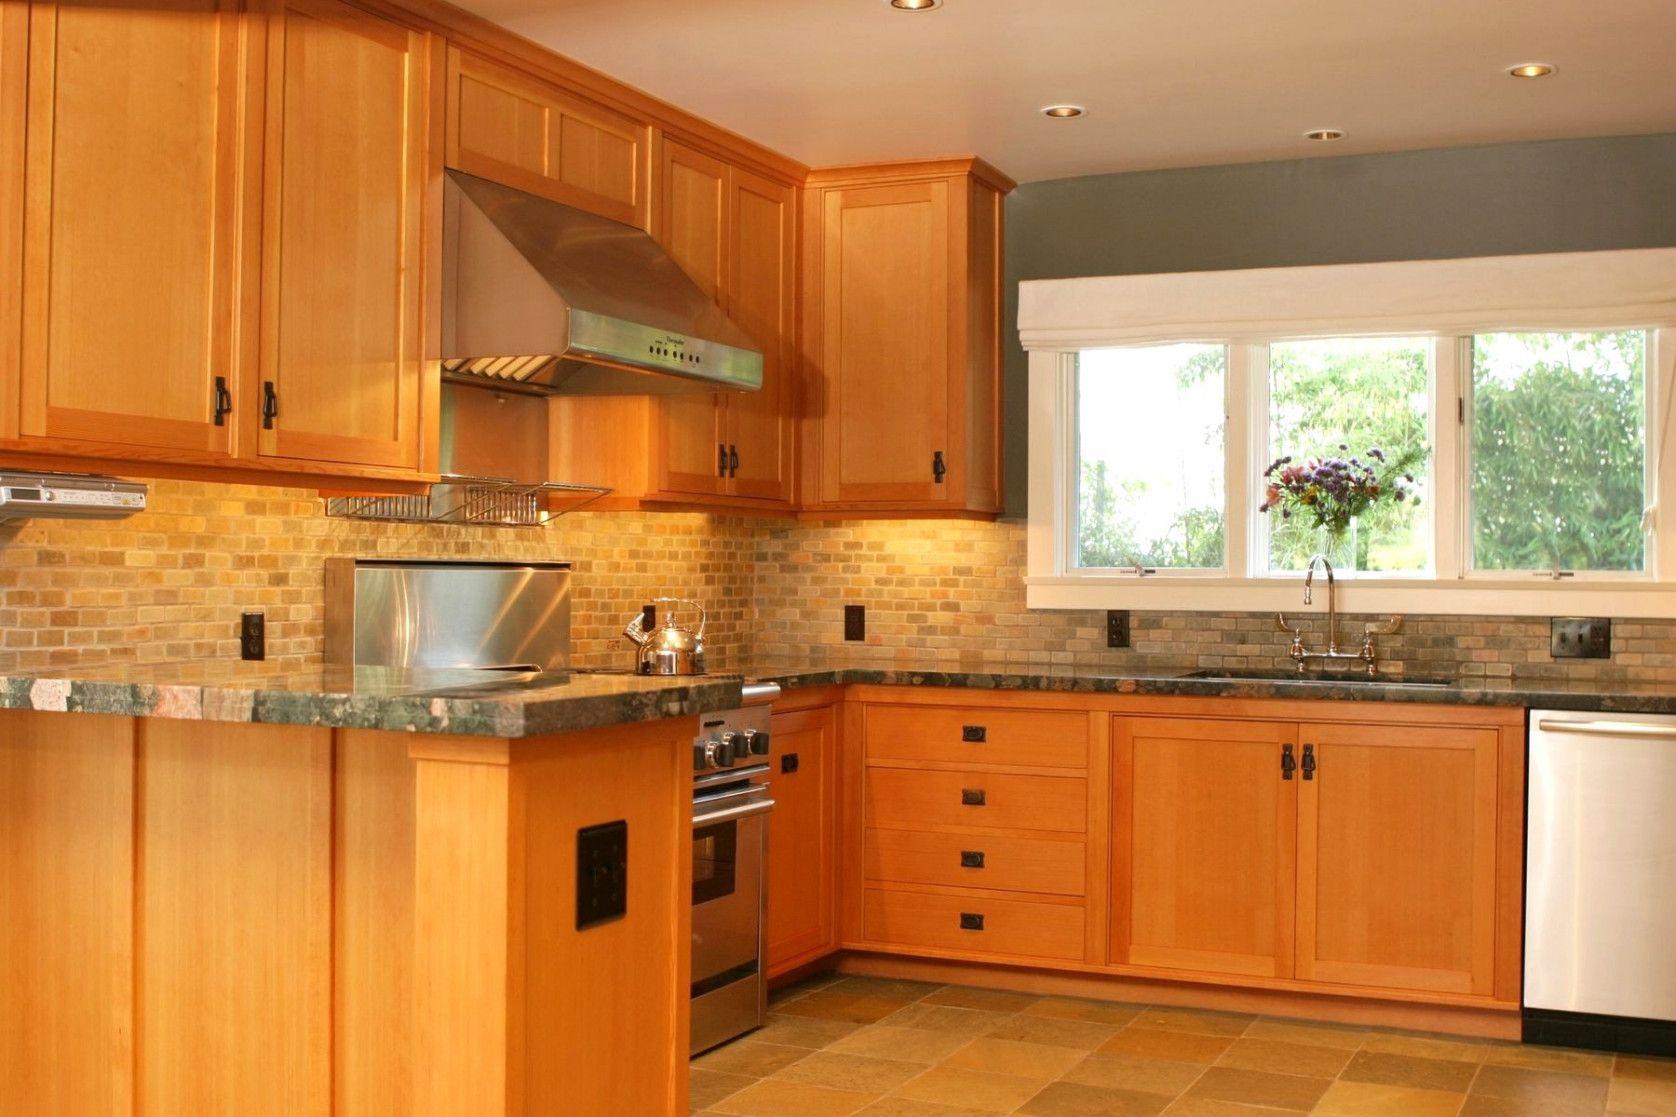 50 Vertical Grain Fir Kitchen Cabinets Kitchen Design And Layout Ideas Check More A Kitchen Cabinets Kitchen Cabinets And Countertops Kitchen Cabinet Design